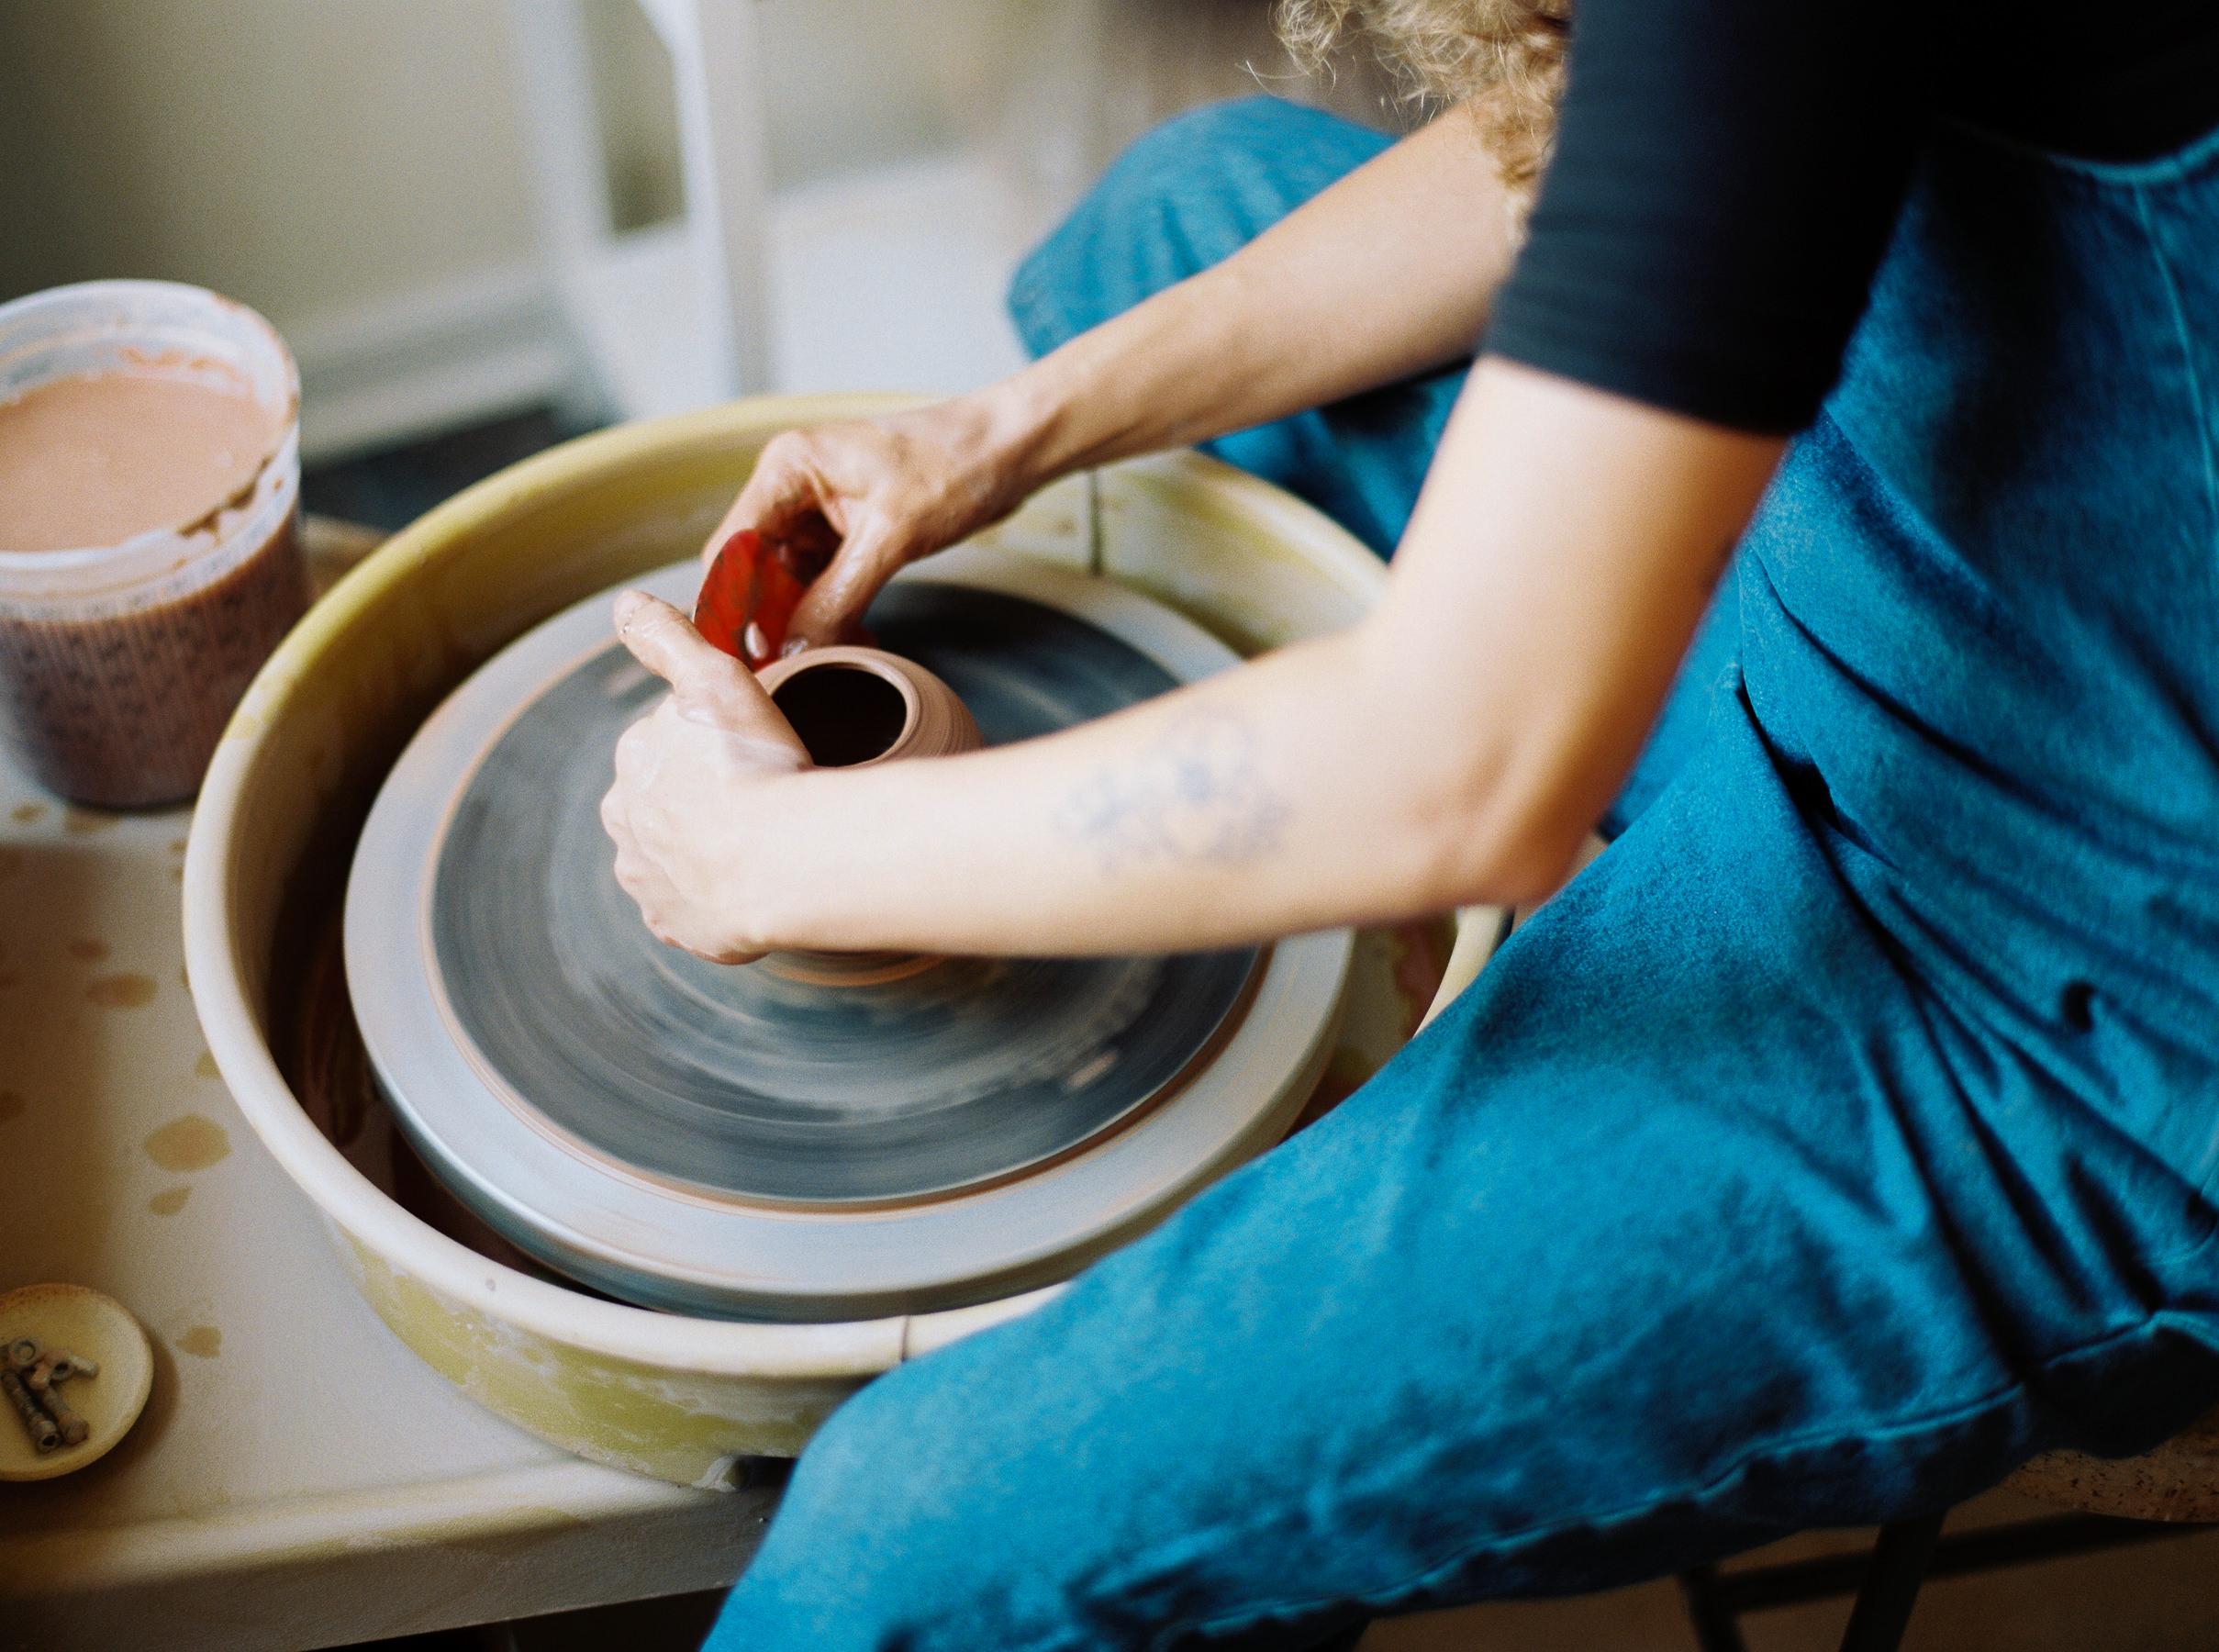 artistprofile-katherinemoes-pottery-annapeters-annapetersphoto-unearthing.tc-14.jpg